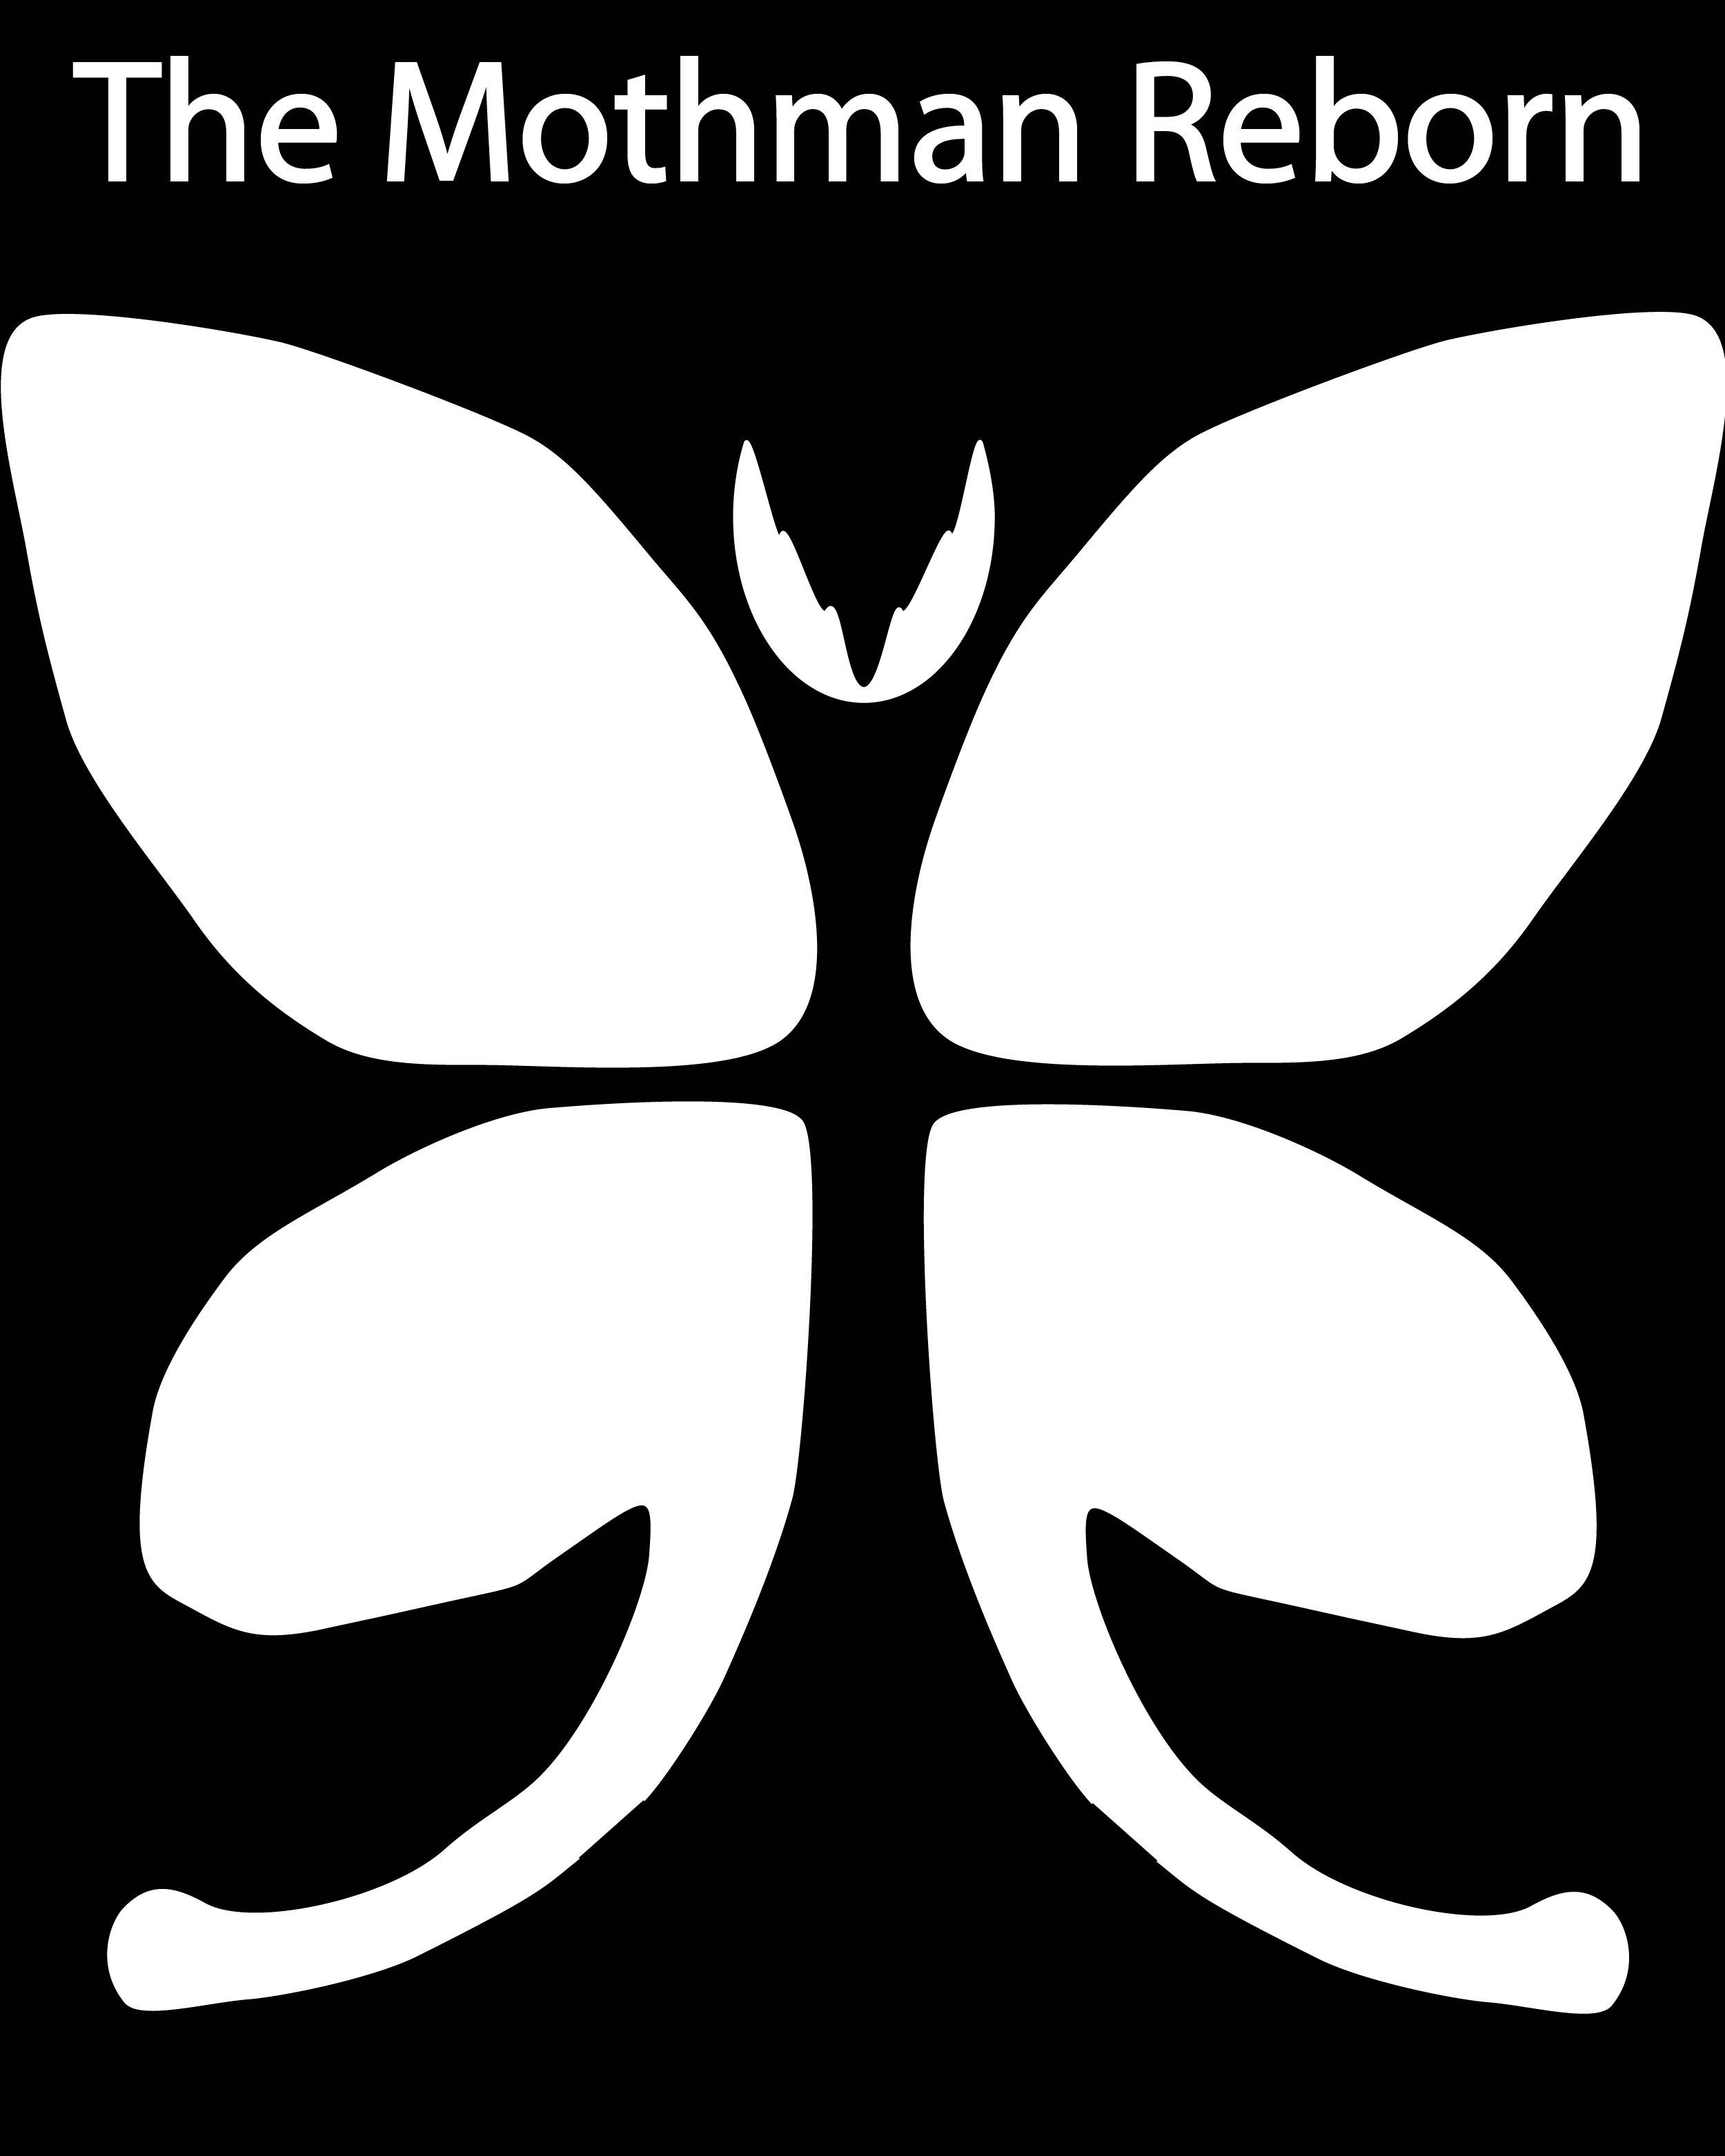 The Mothman Reborn Best